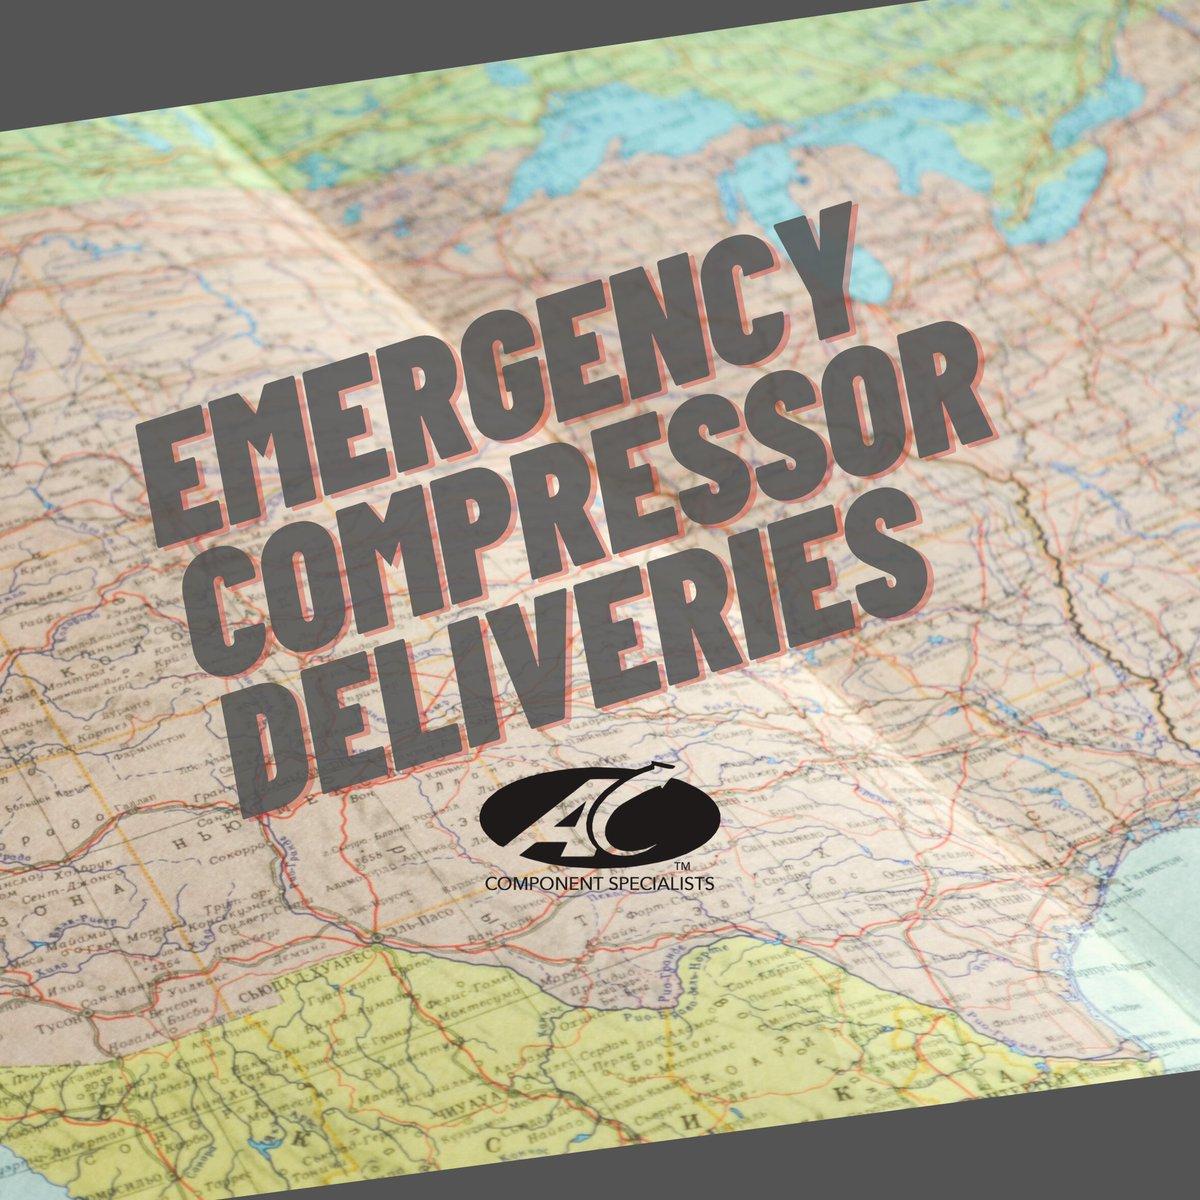 Read our customer testimonial on an #accs emergency #delivery of a #hitachi #screwcompressor on our LinkedIn post link below.  https://www.linkedin.com/feed/update/urn:li:activity:6687420409178071040…   #compressor #compressors #remanufacture #hvaclife #hvacr #fusheng #york #trane #carlyle #customerservicepic.twitter.com/gkqWw1yDkr